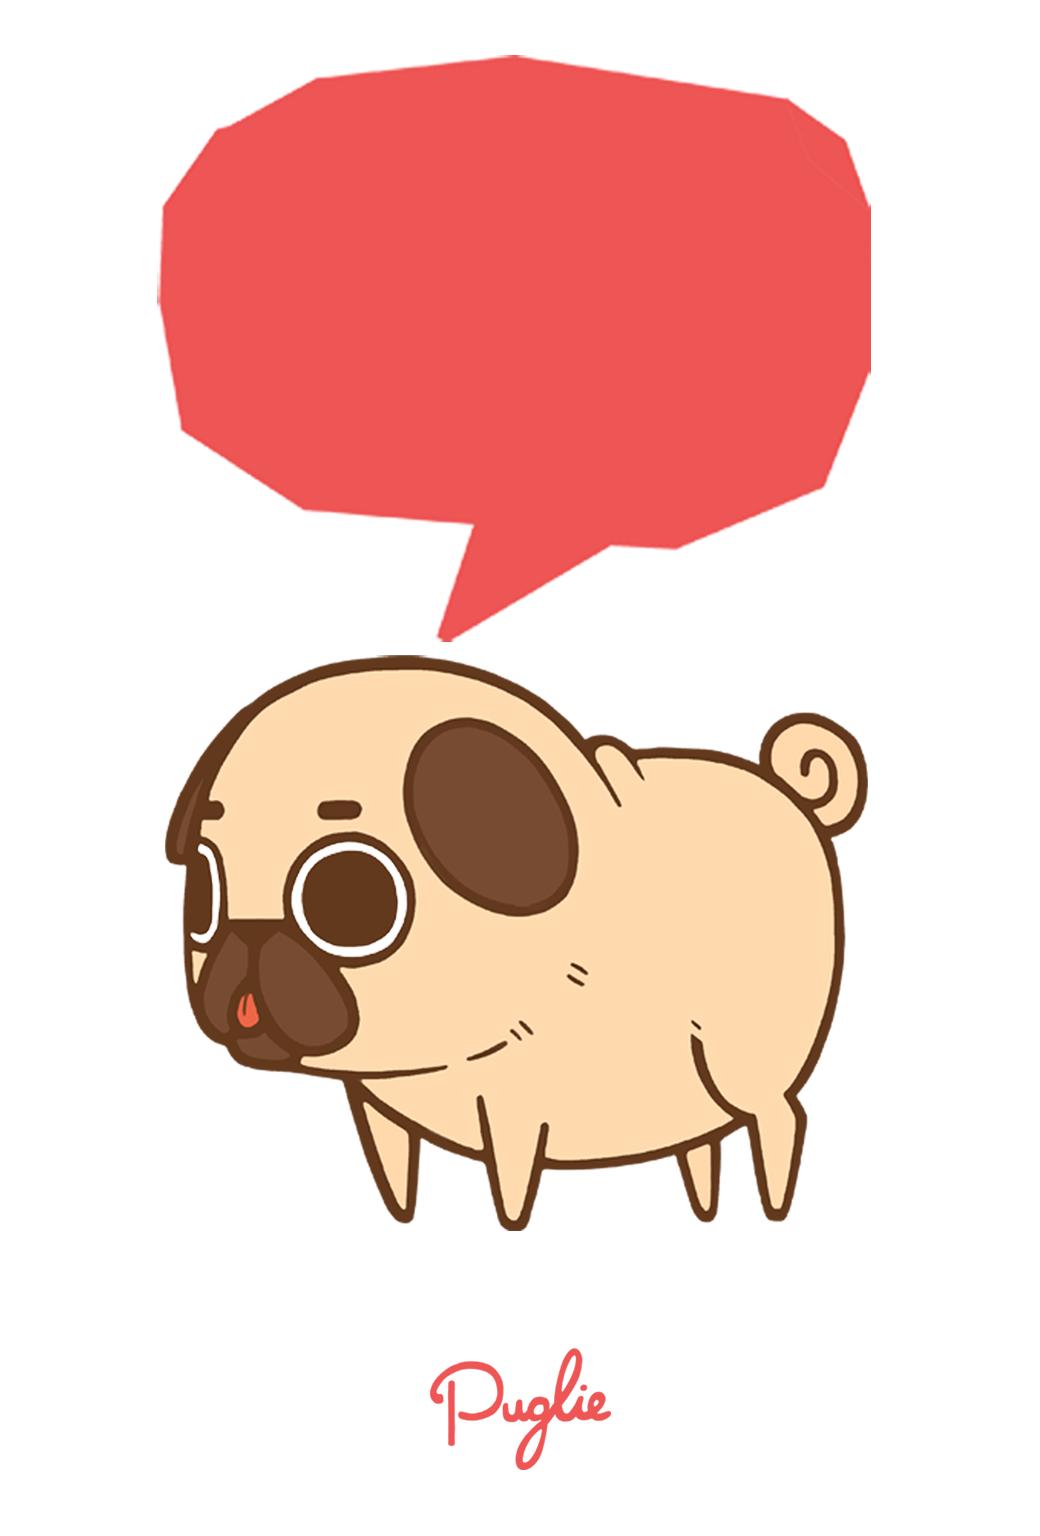 Drawn pug tumblr backgrounds ArtWallpapers on Gina Meerendonk van